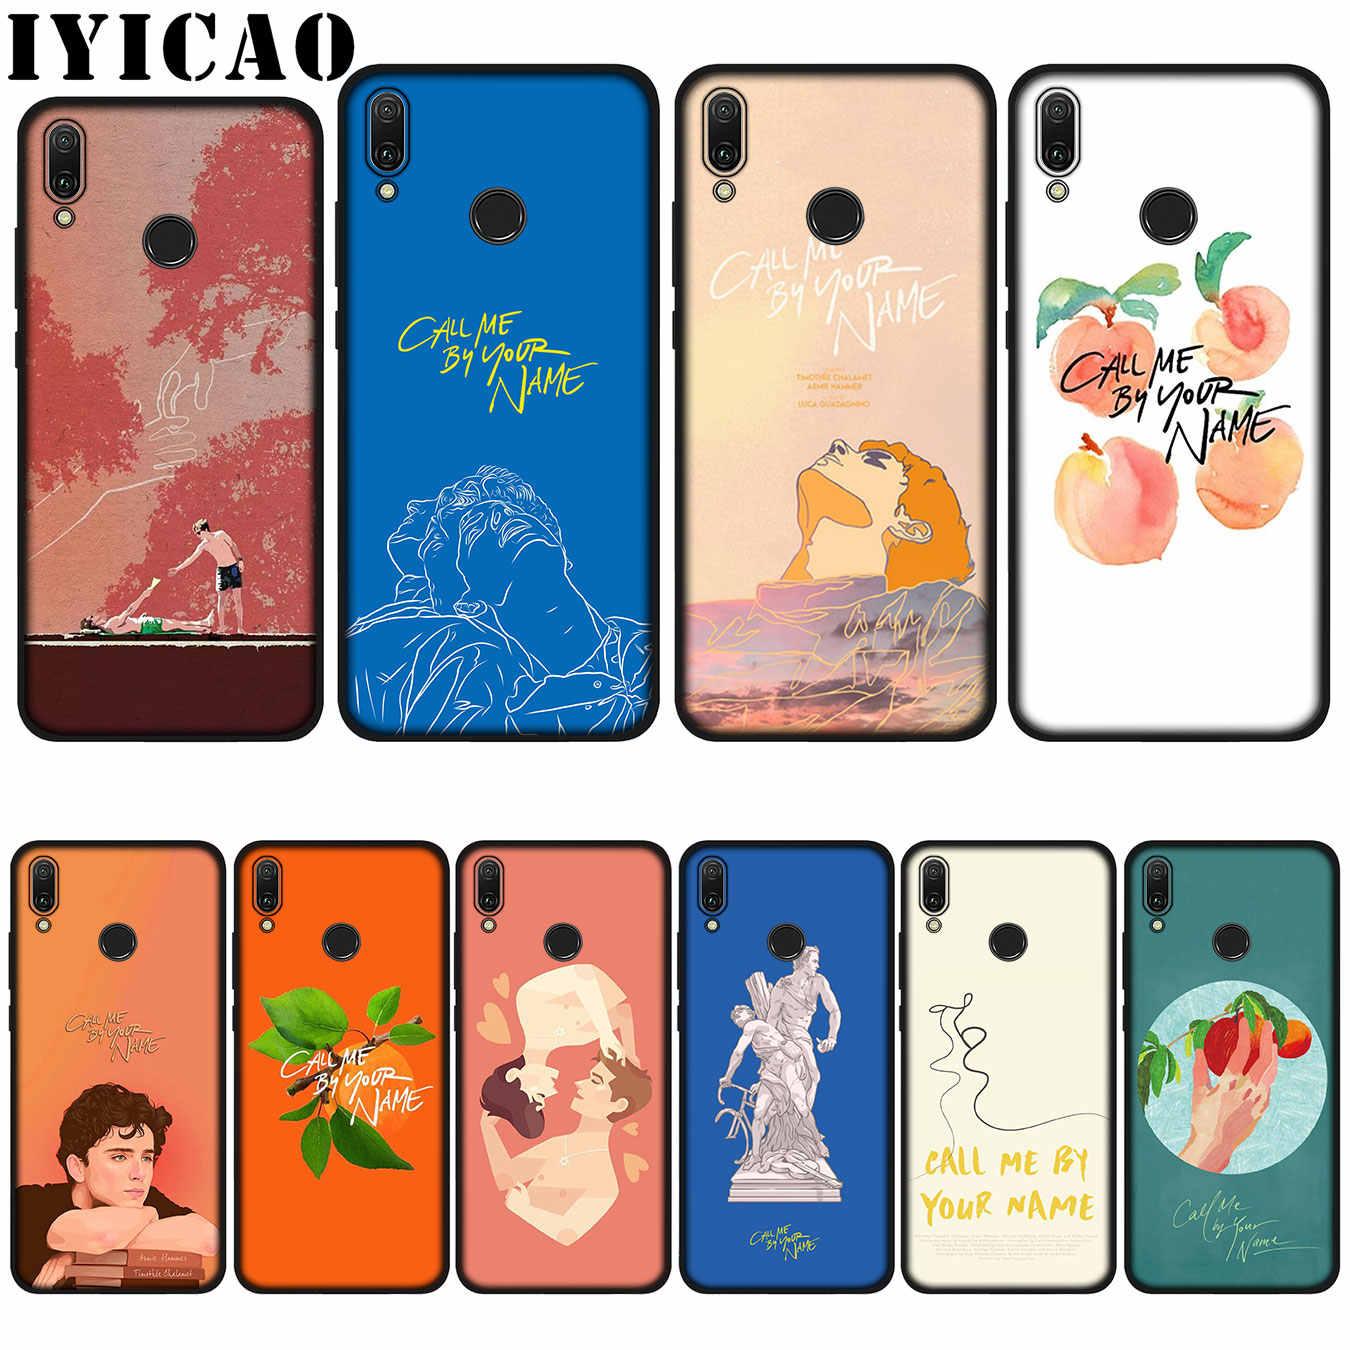 IYICAO Me llaman por su nombre cartel de silicona suave caso de Huawei P20 Pro P10 P8 P9 Lite Mini 2017 P Smart 2019 cubierta